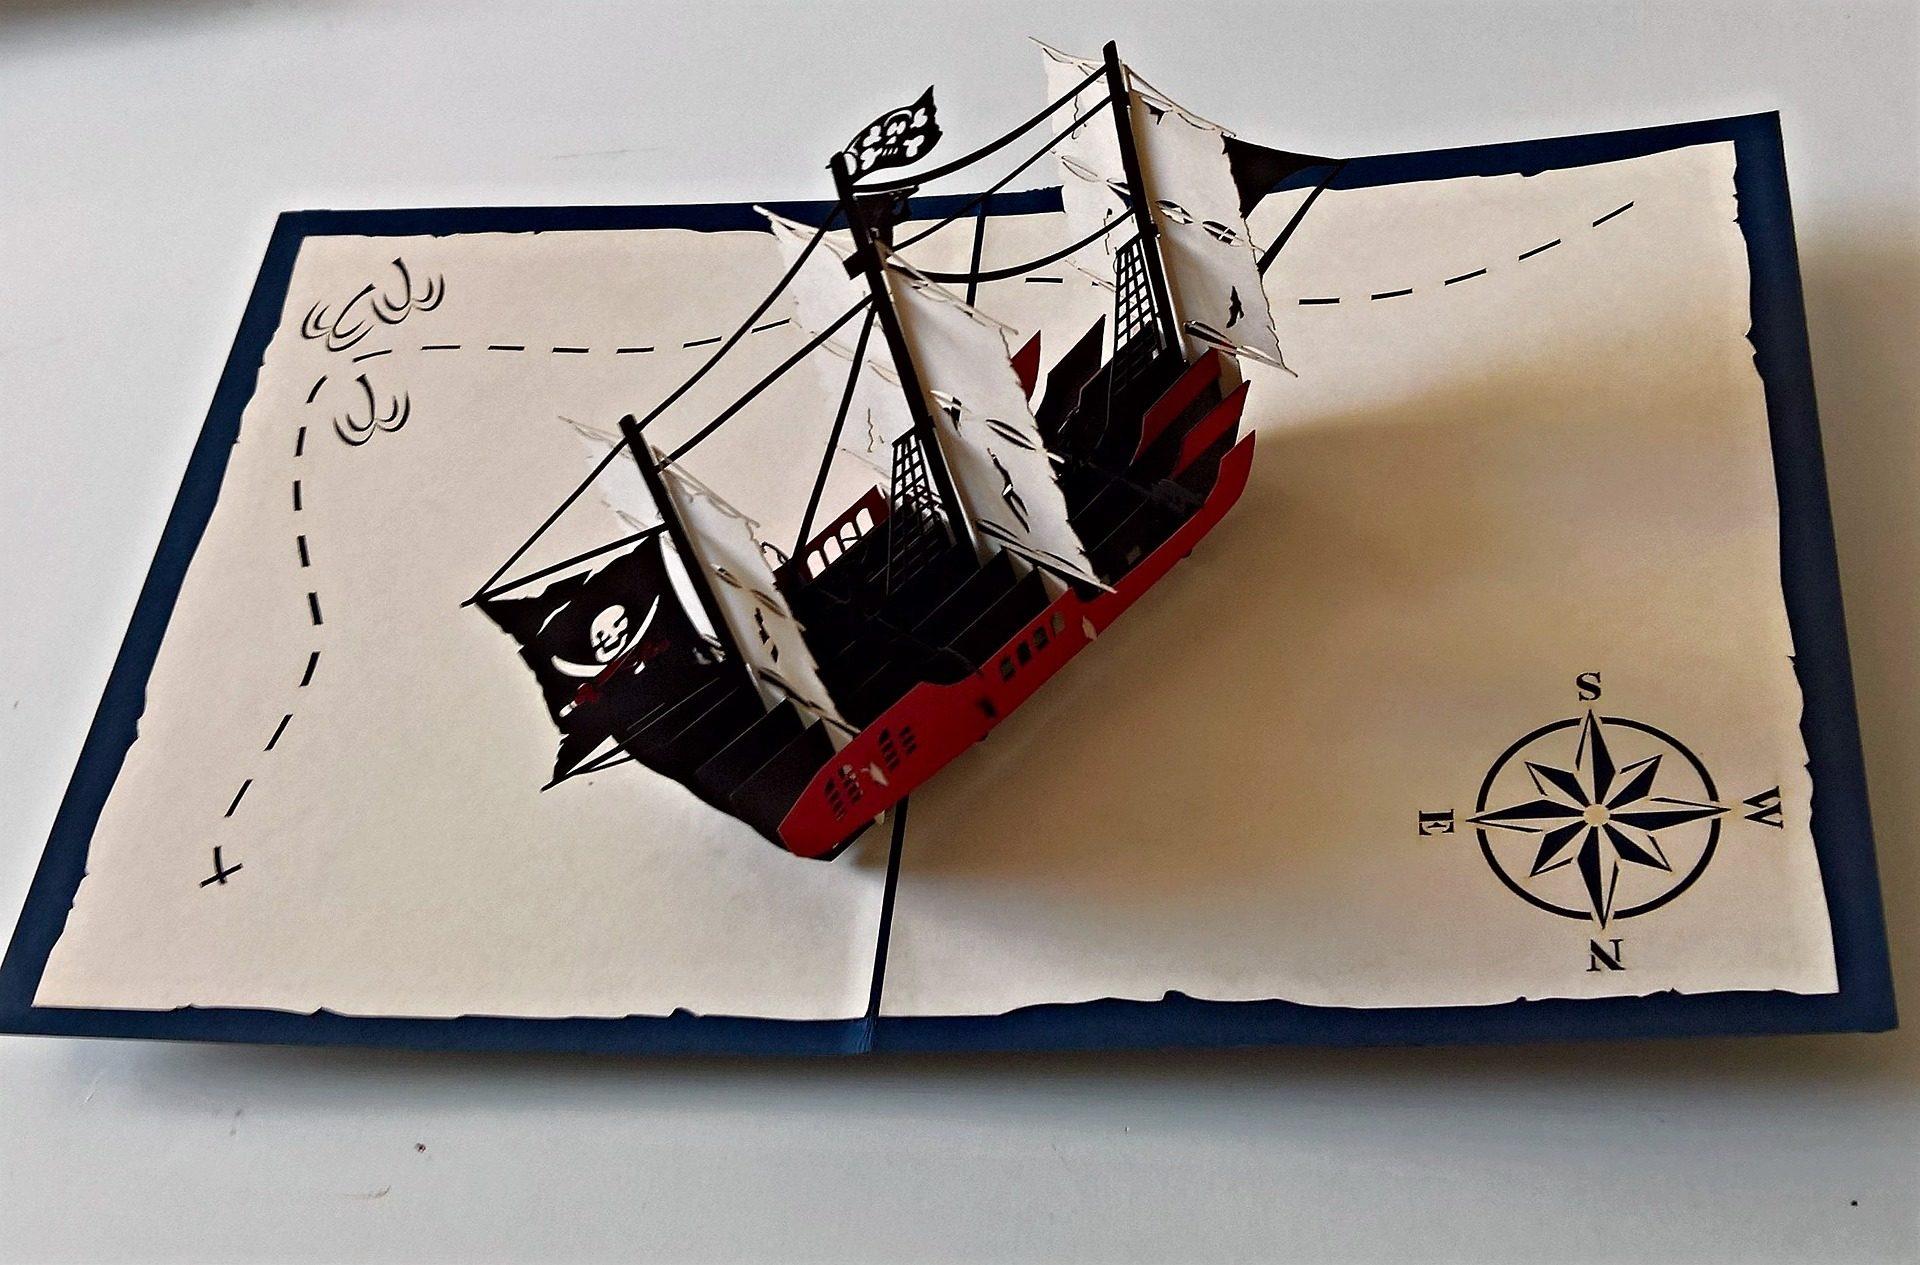 mapa, лодка, П�Карта, tarjeta, Приветствие, 3d - Обои HD - Профессор falken.com